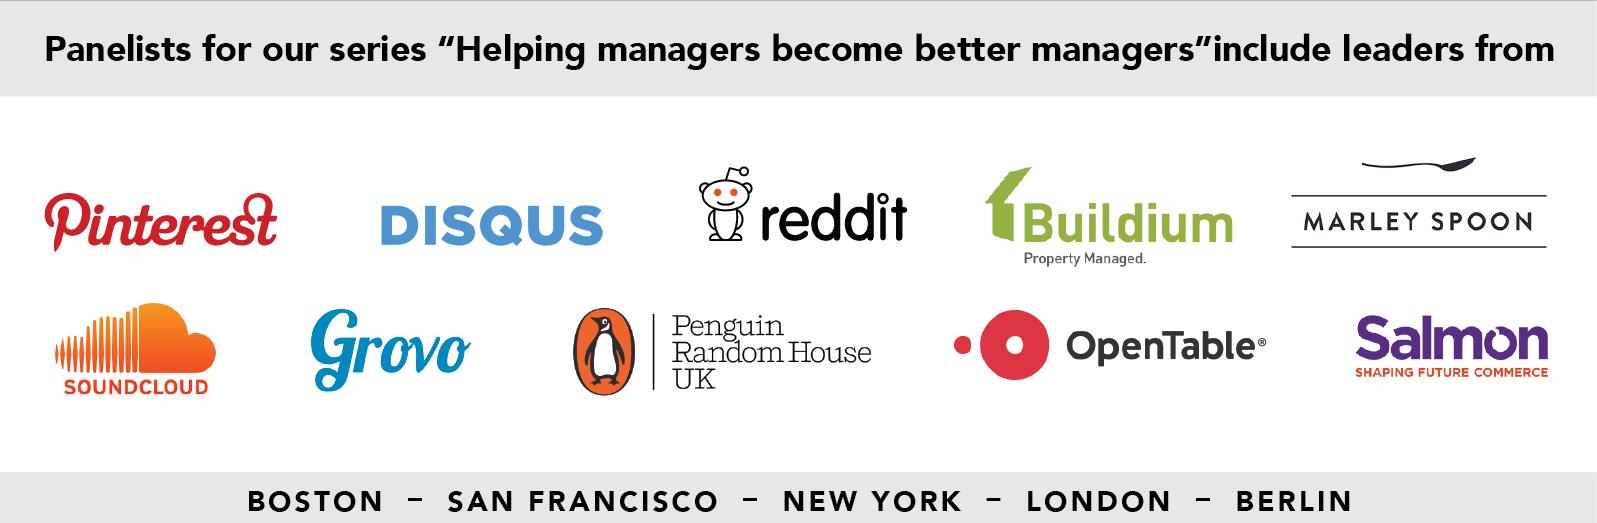 Manager_Panel_series_teaser_medium-04.png